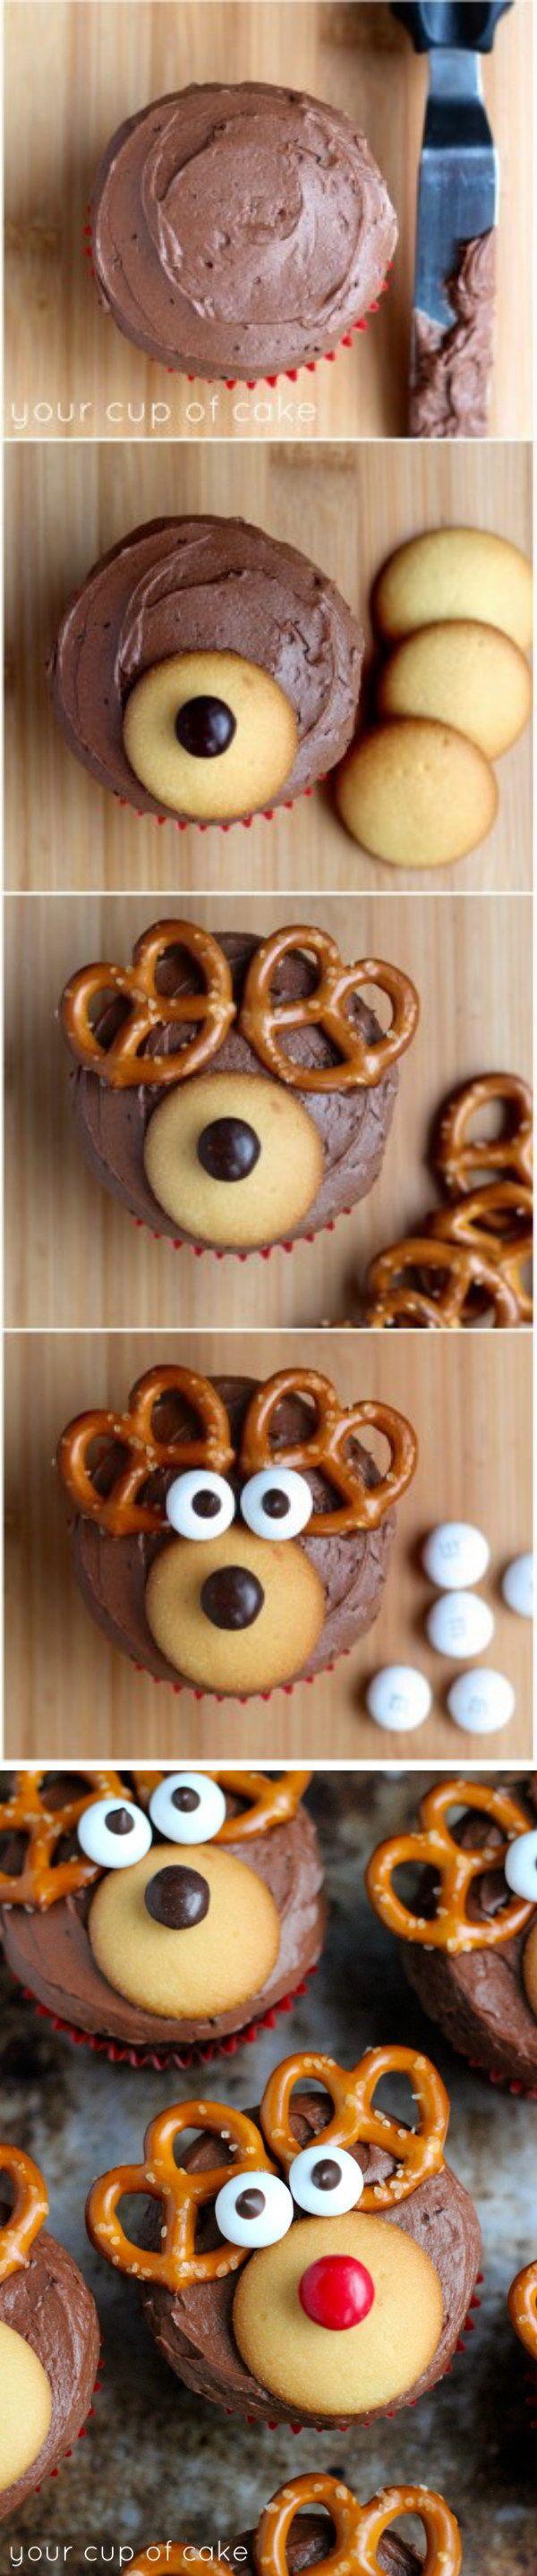 Homemade Reindeer Cupcakes.